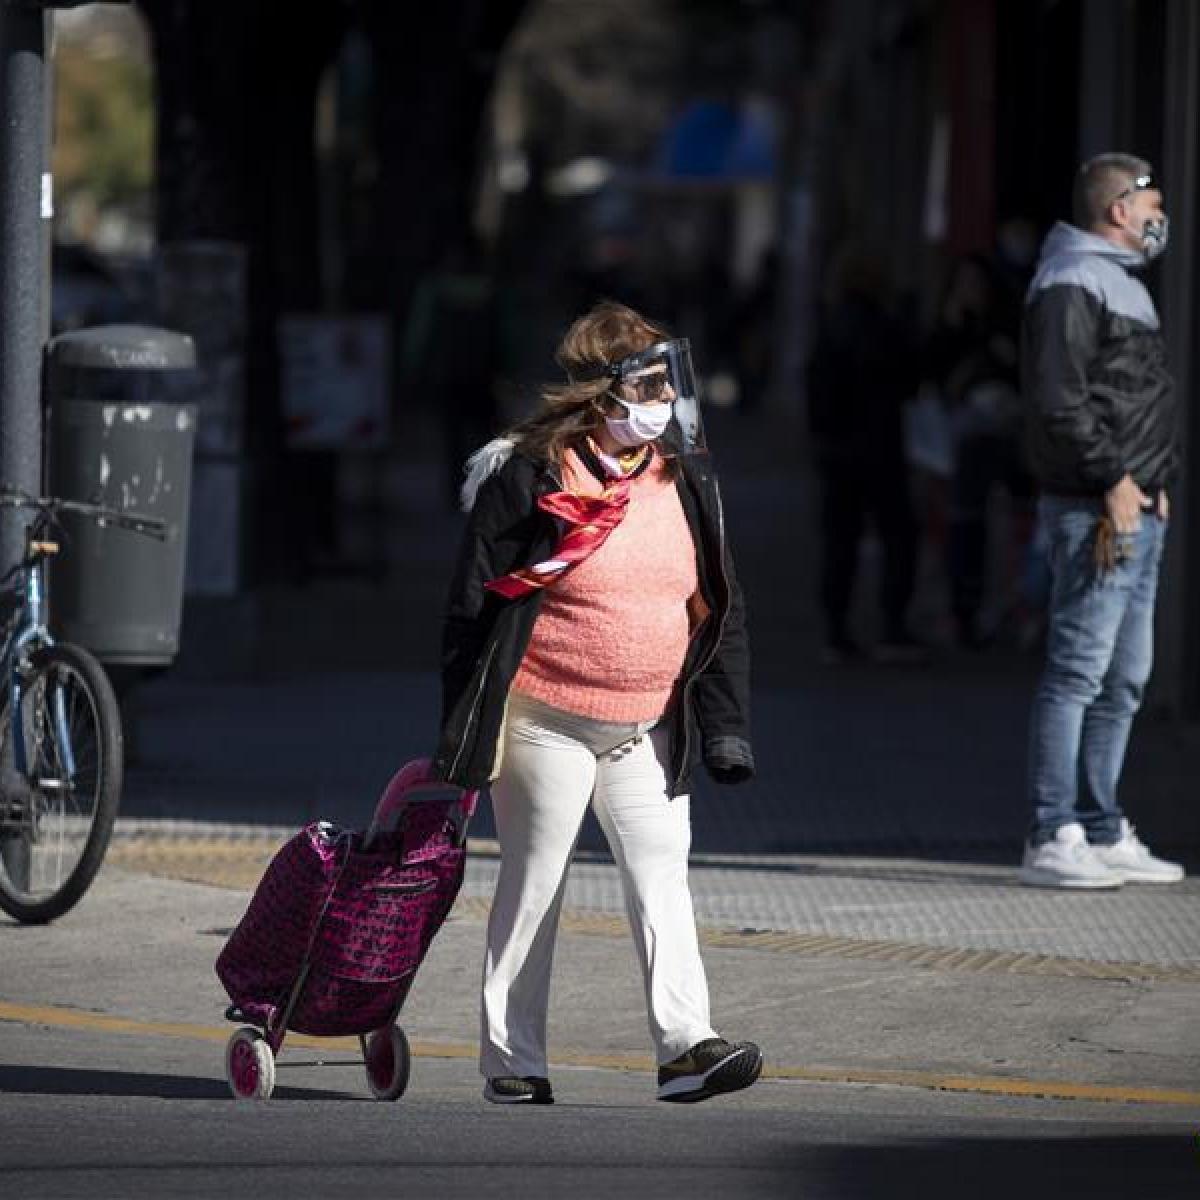 Argentina extends COVID-19 quarantine till August 2